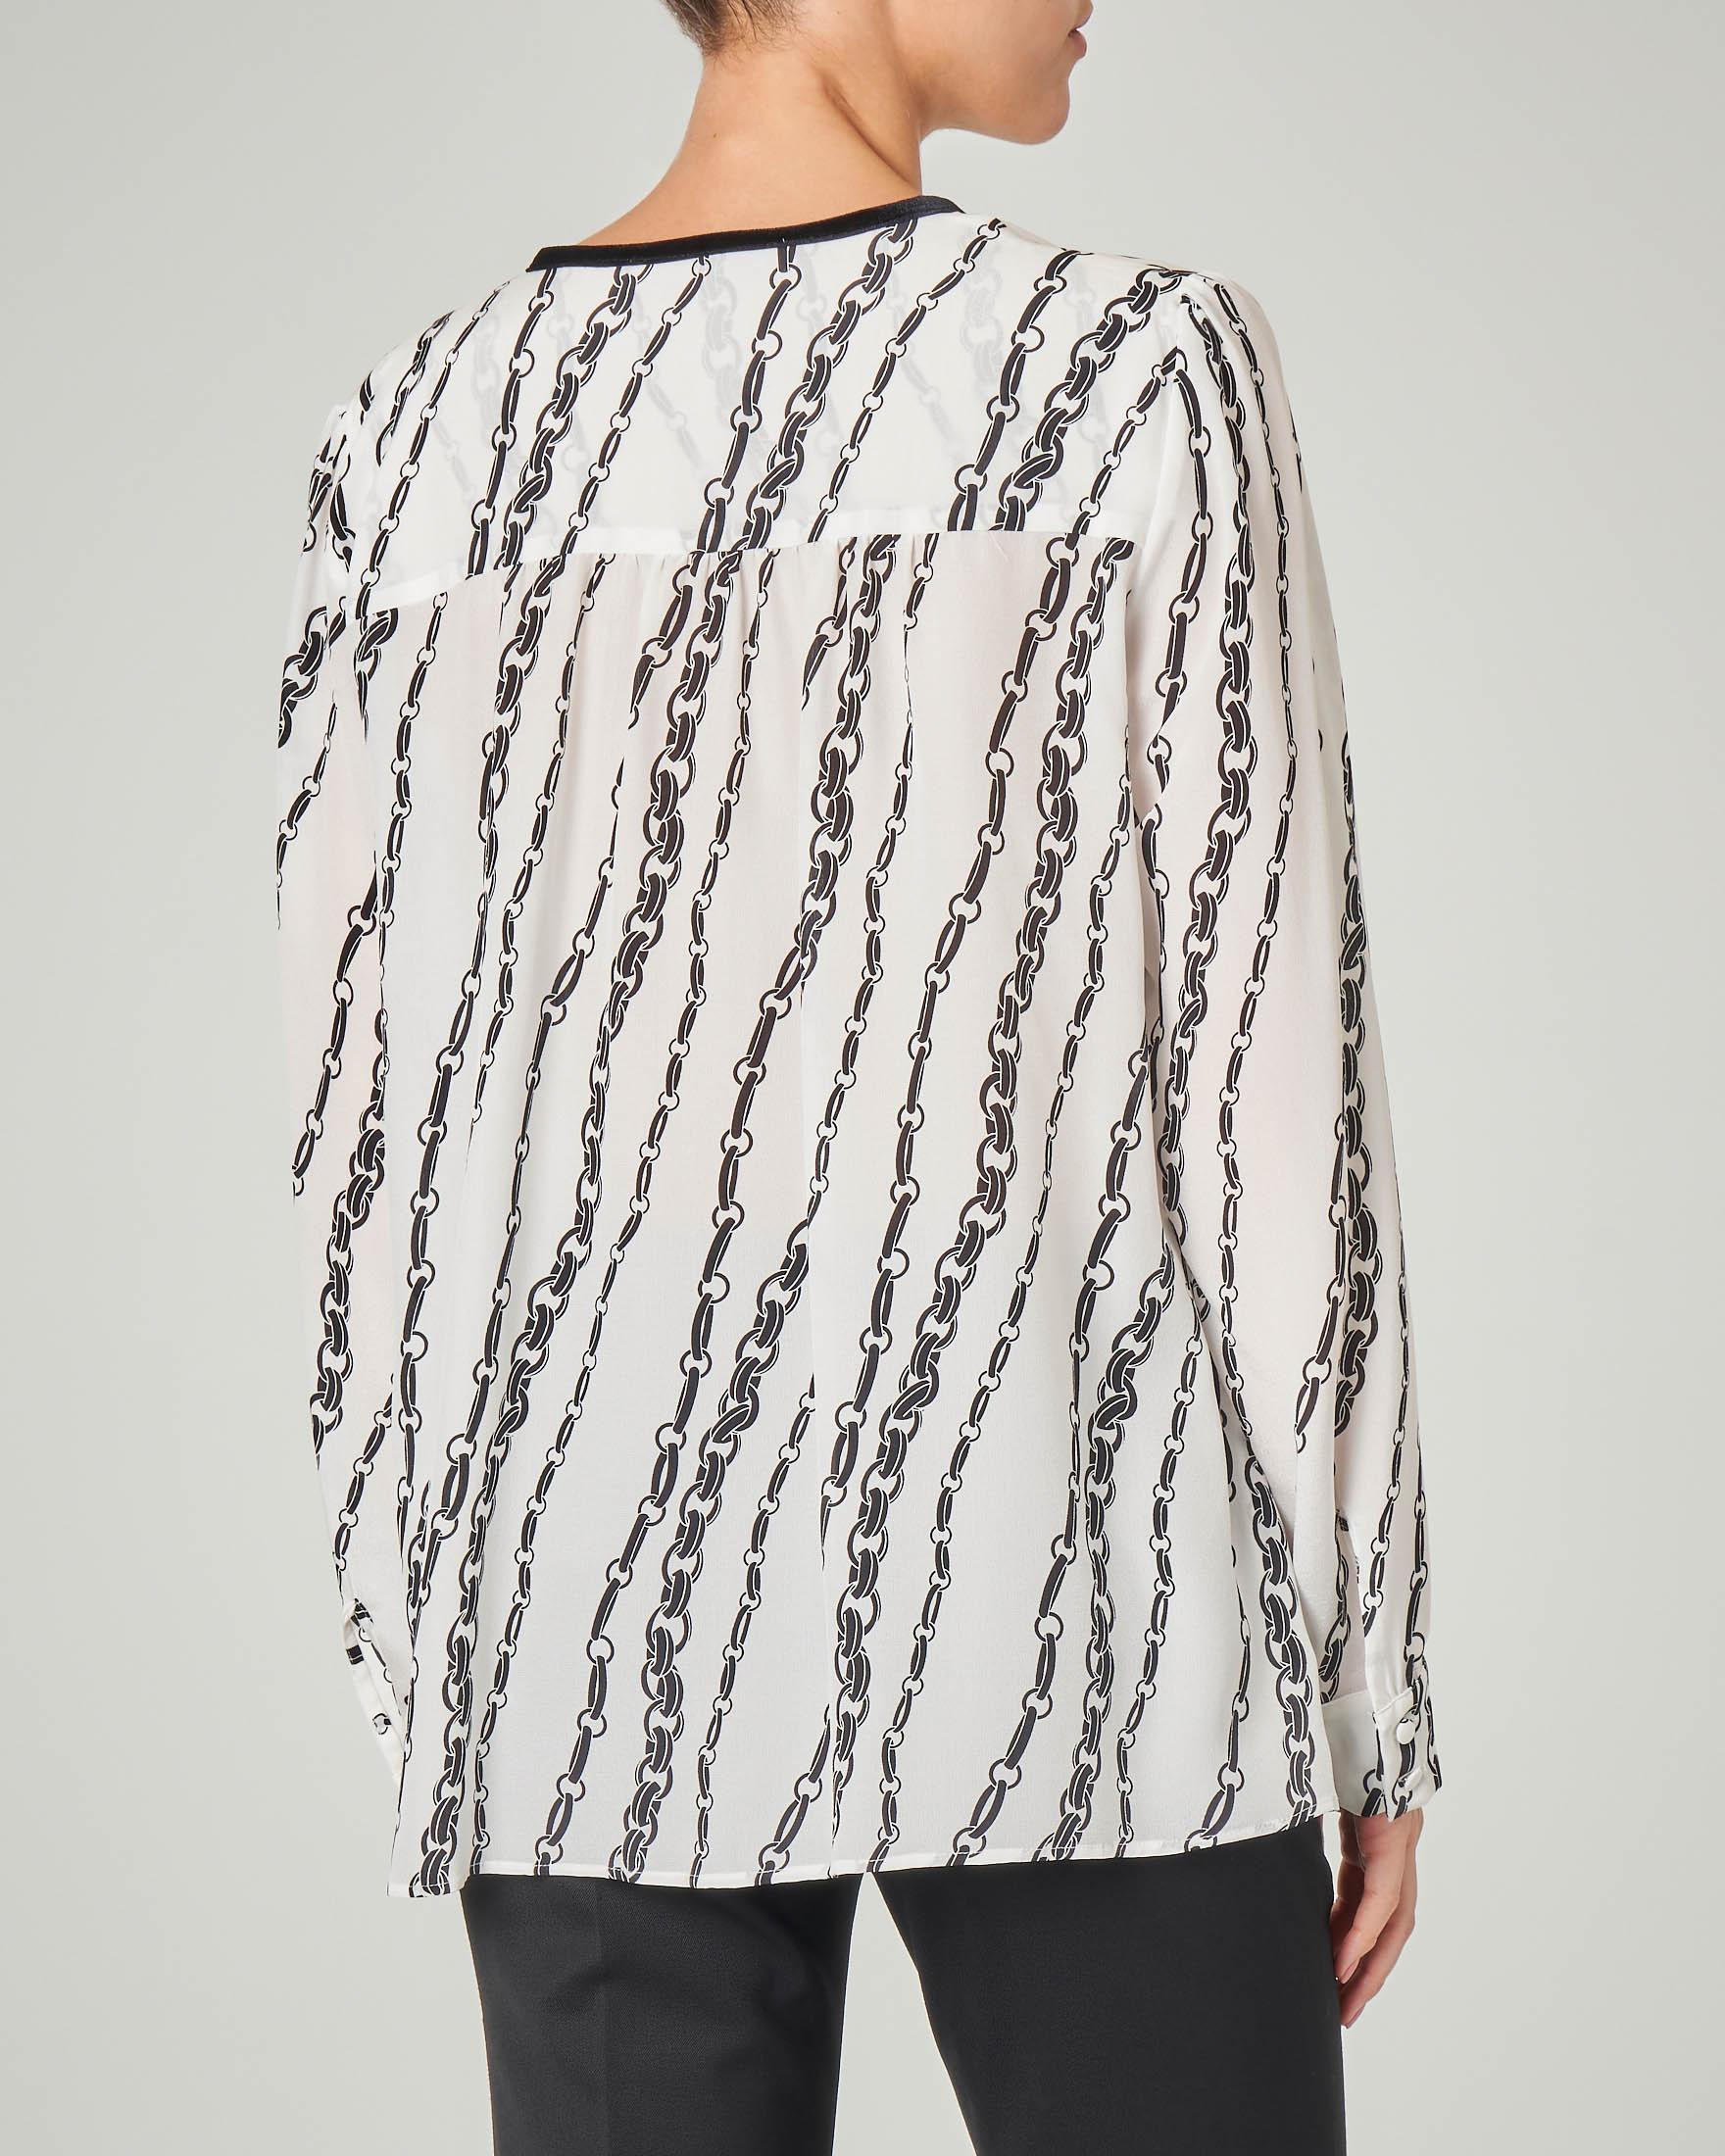 sale retailer 2303a f28f7 Camicie Eleganti Donna: scoprile tutte Online | Pellizzari